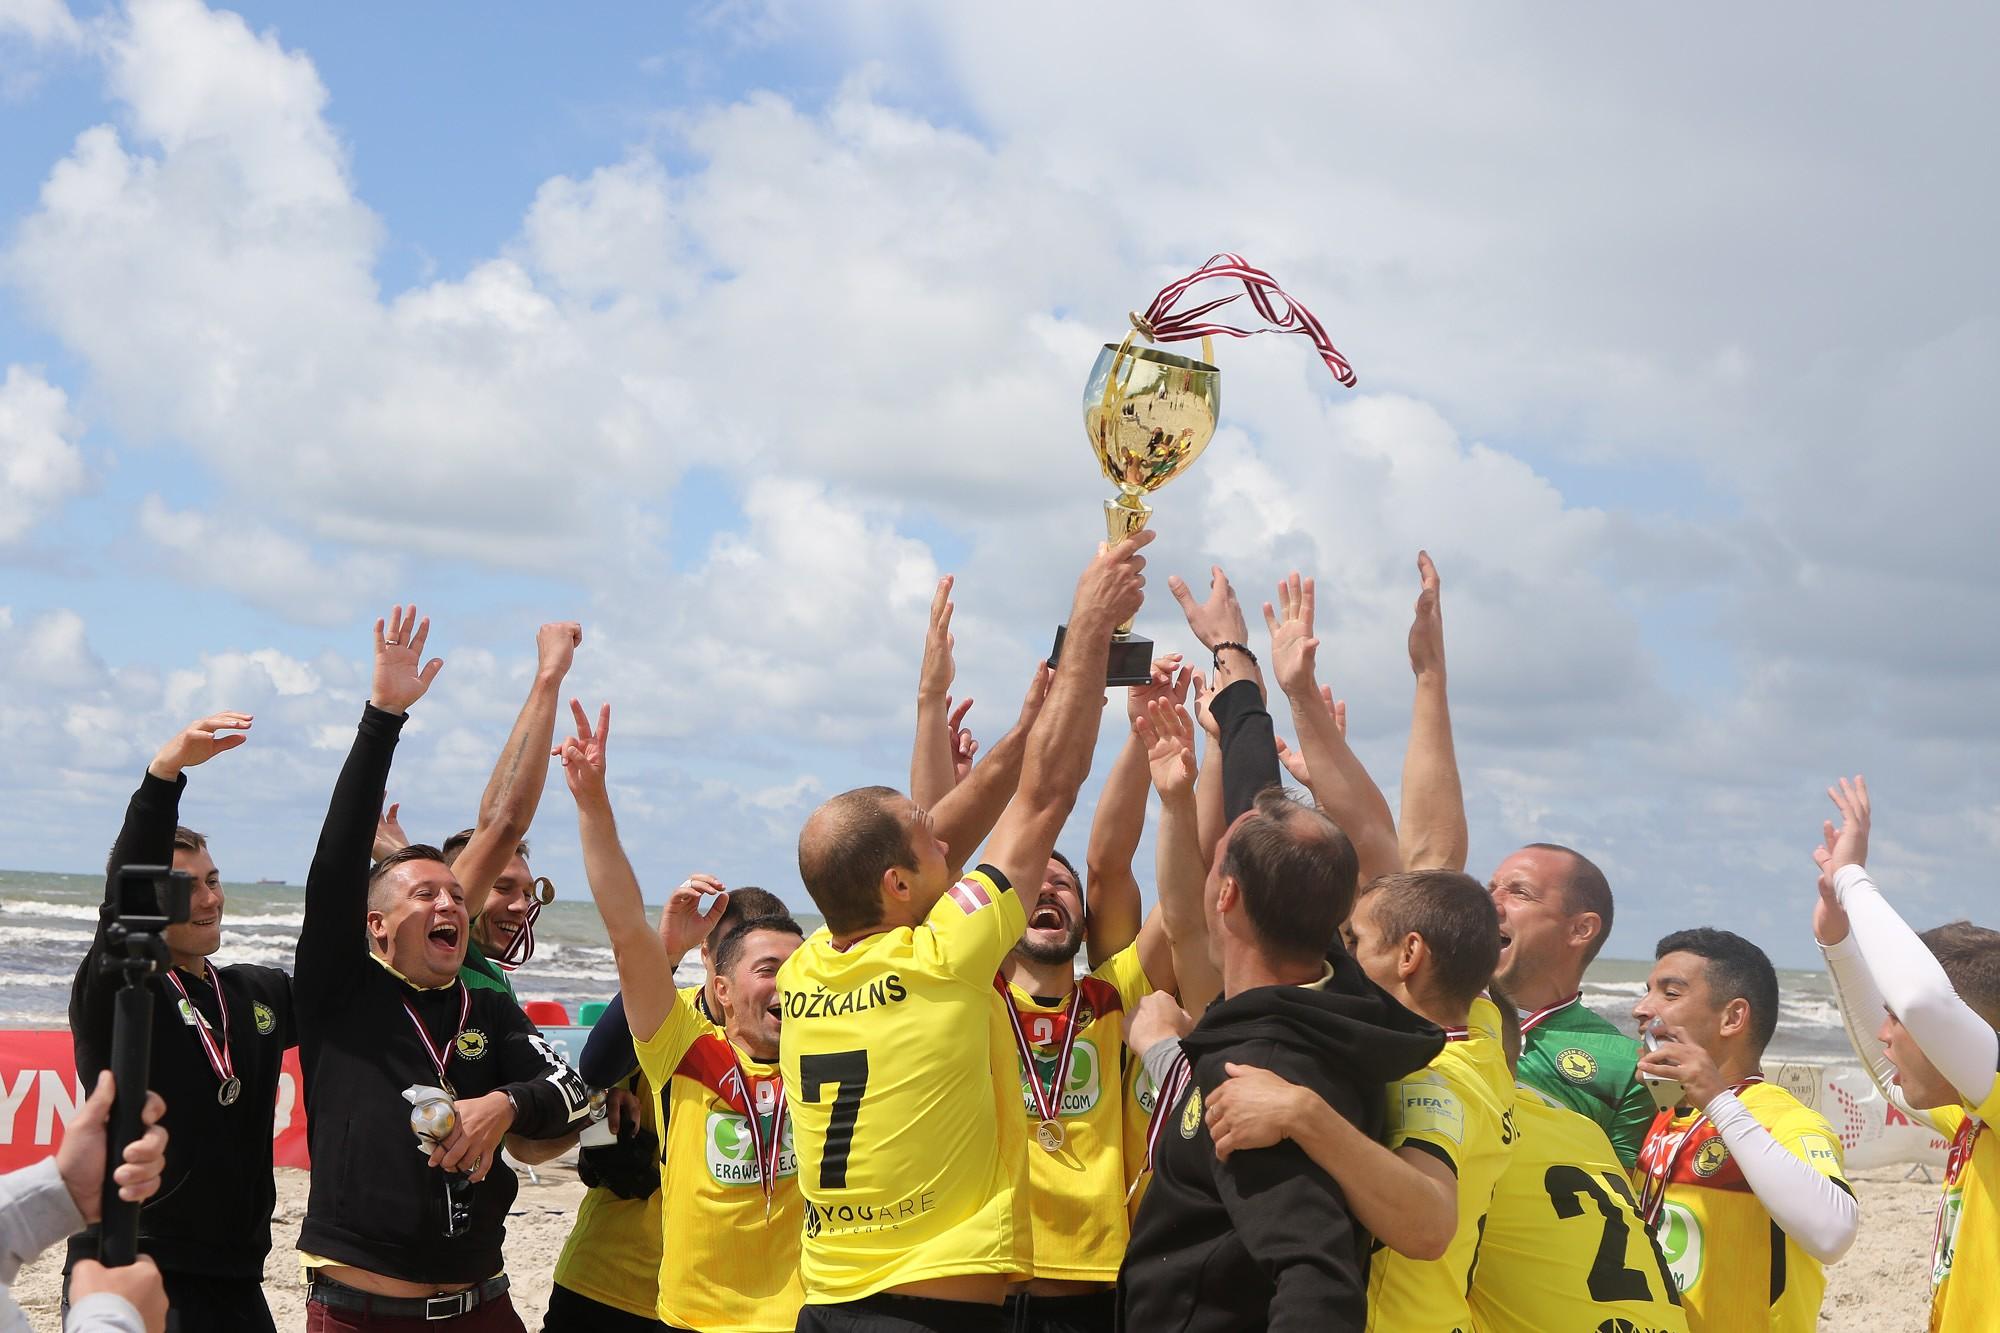 Кубок Латвии взяла лиепайская команда